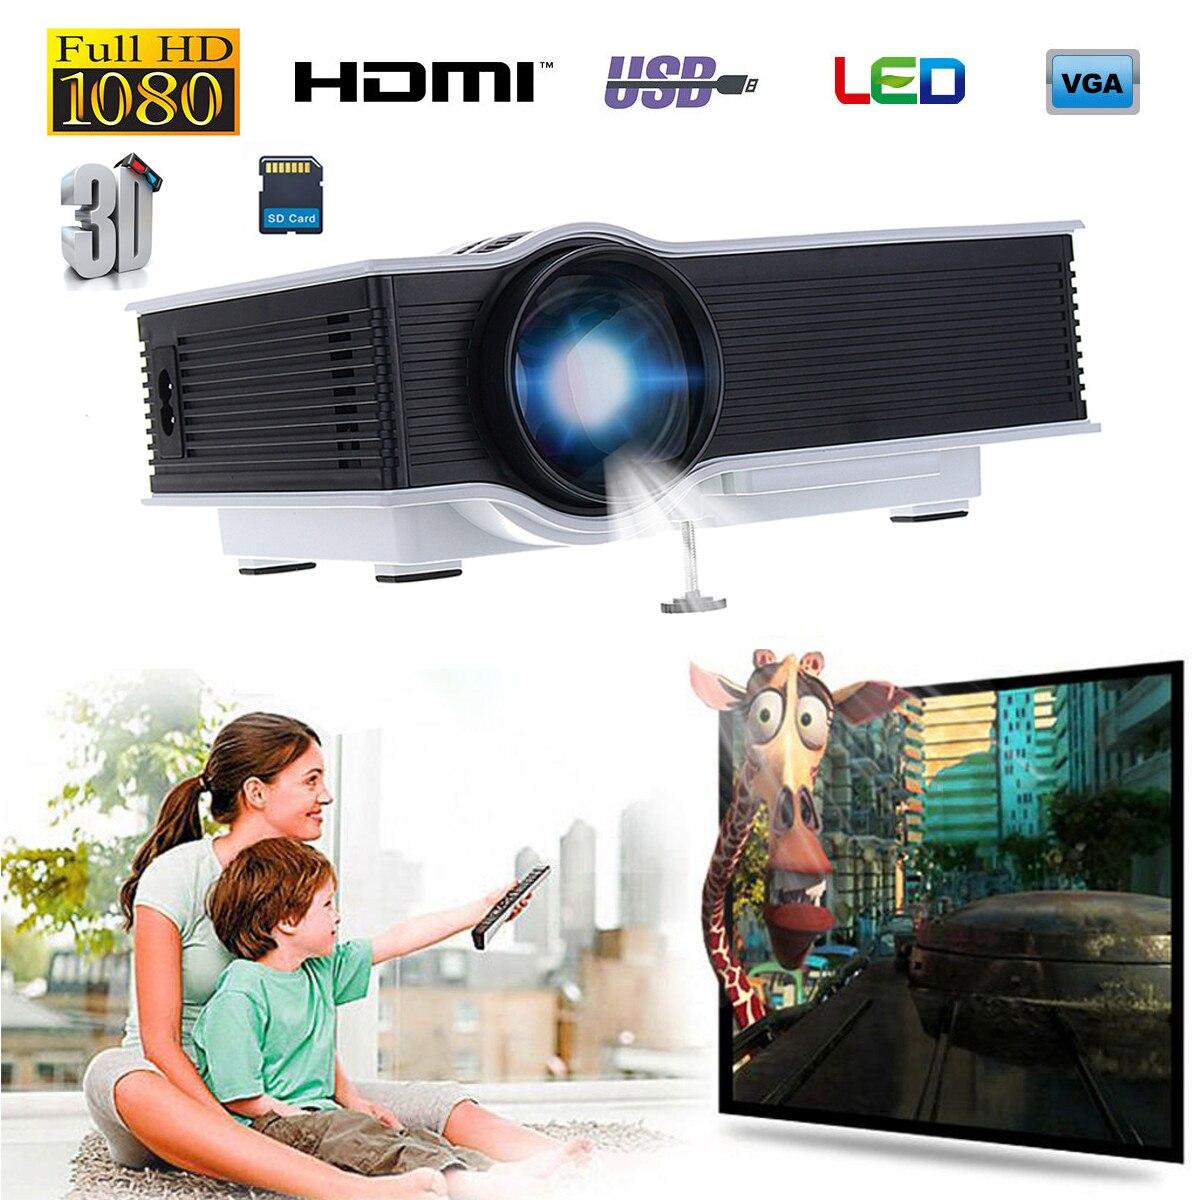 Para GIGXON G40 1200 LM 1080 p Led Projetor Full HD Compatível Início Portátil Mini Projetor HDMI